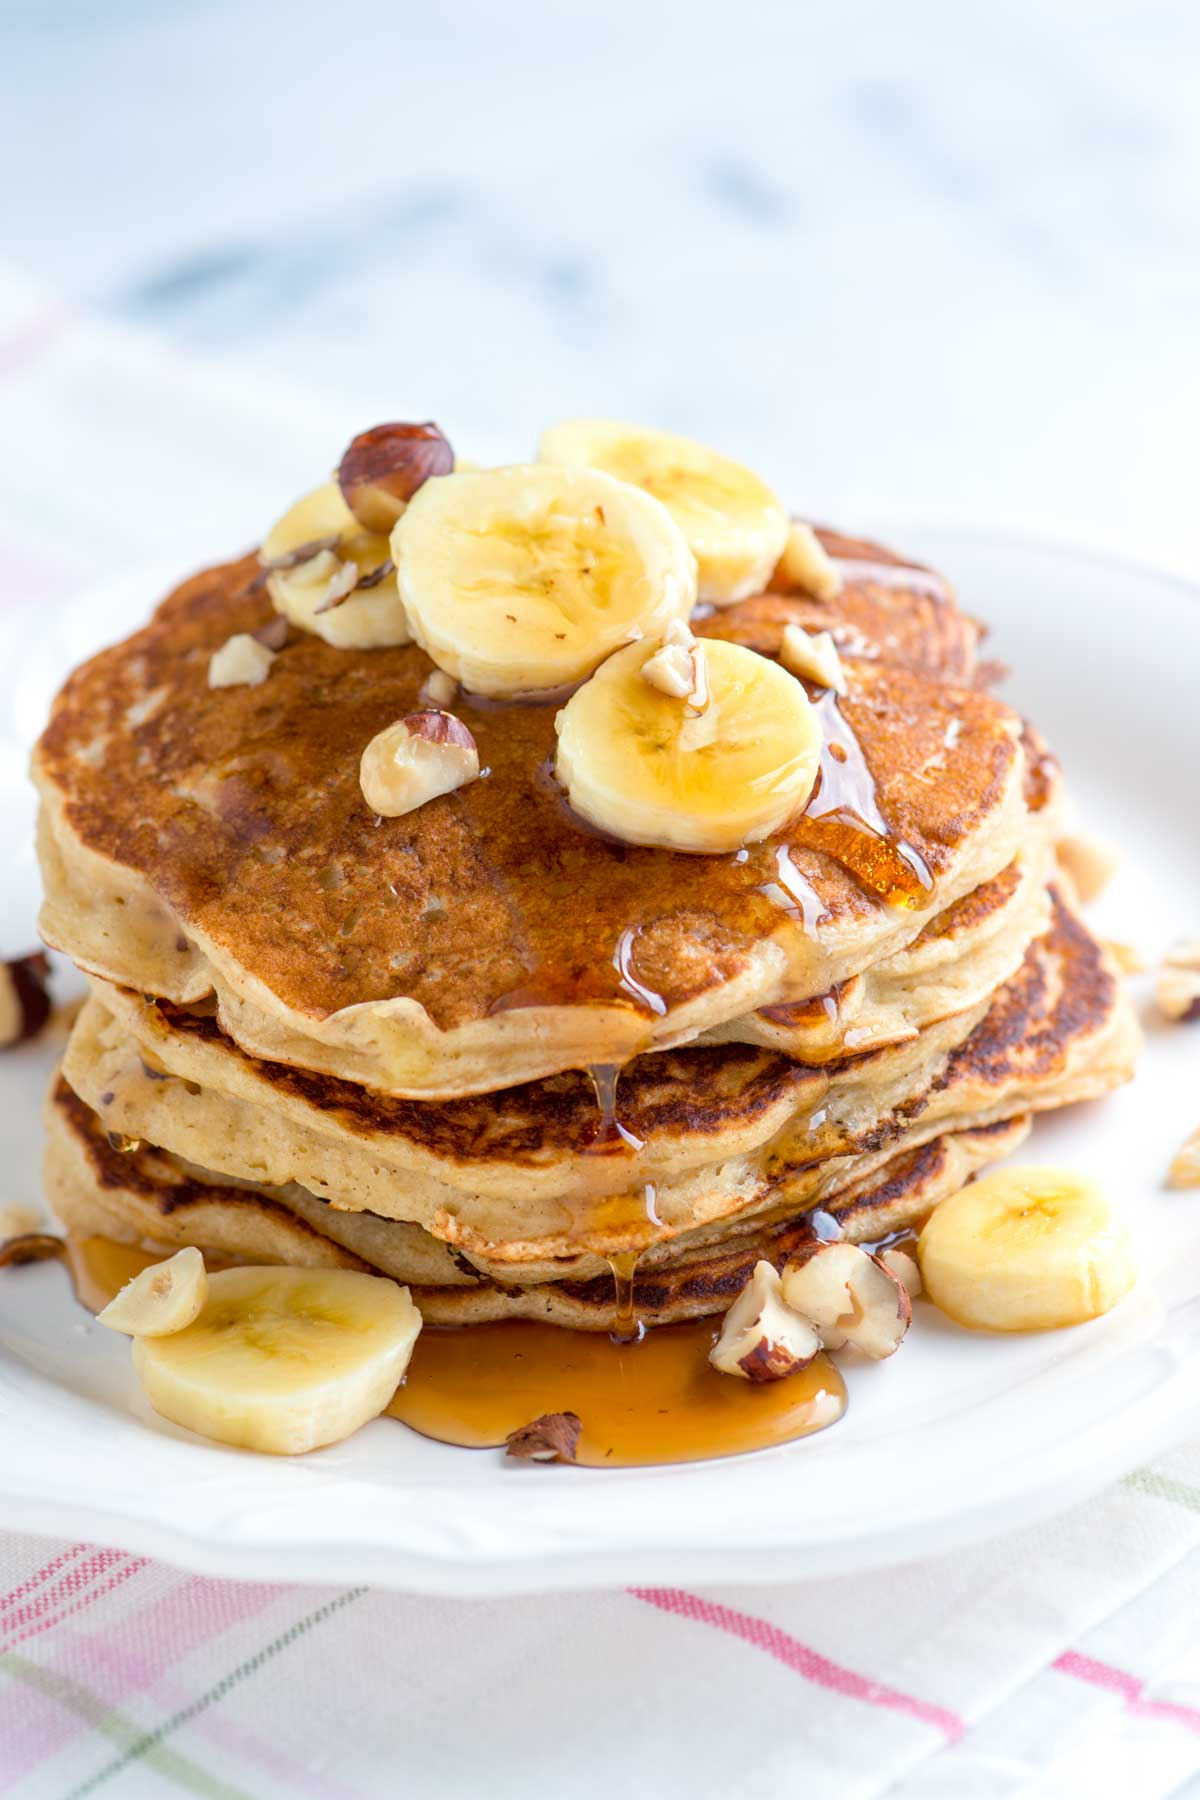 Chickpea Flour Banana Pancakes From Ashley